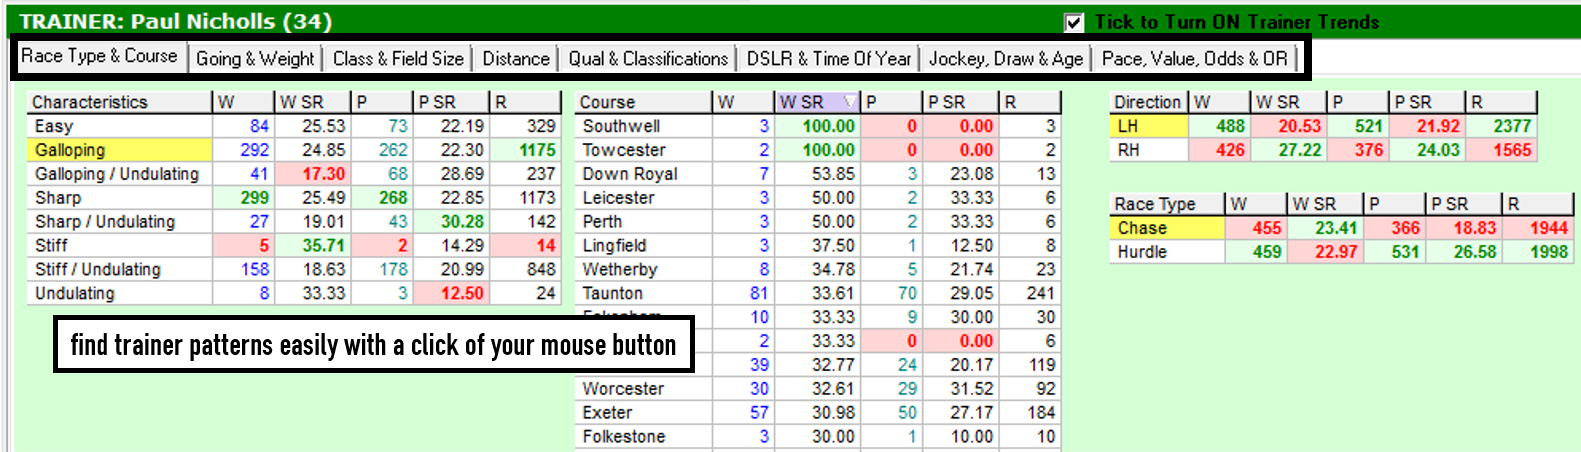 Horse Racing Software Race Guide Cards Proform Racing